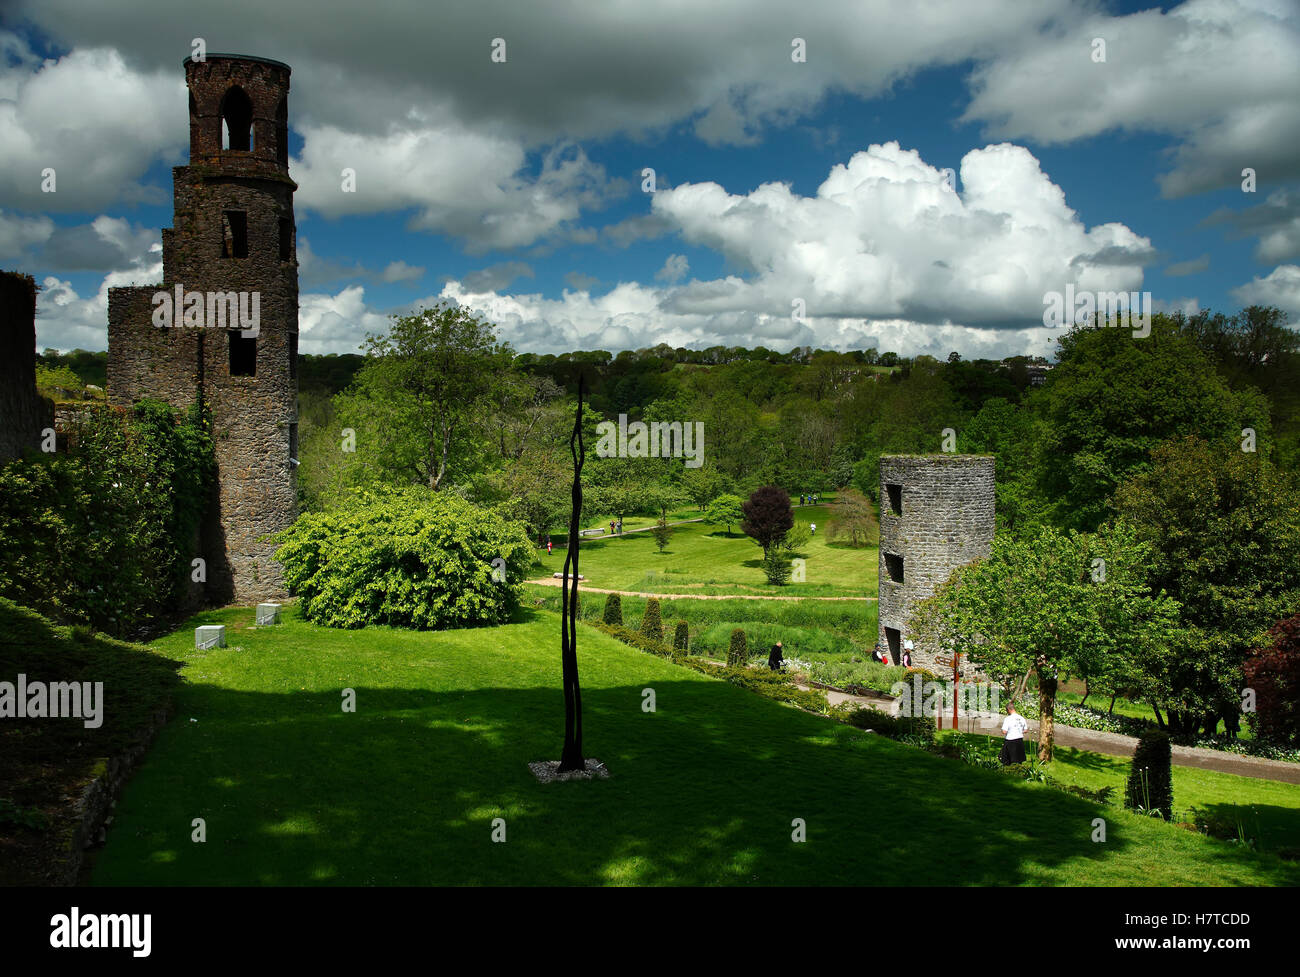 Blarney castle; County Cork, Ireland - Stock Image